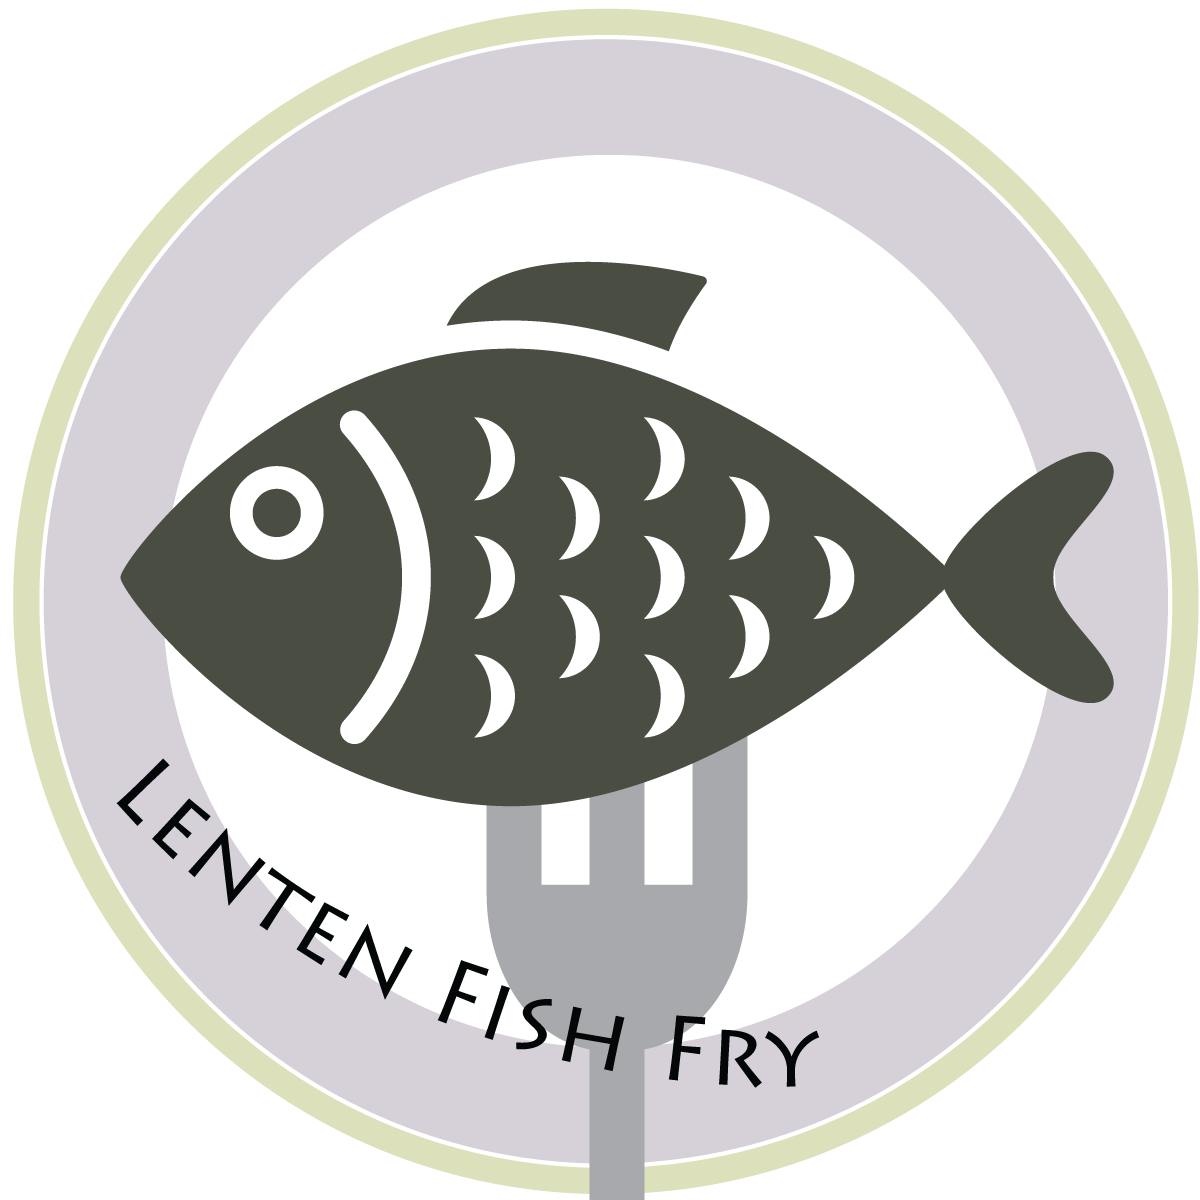 22052 Fish free clipart.